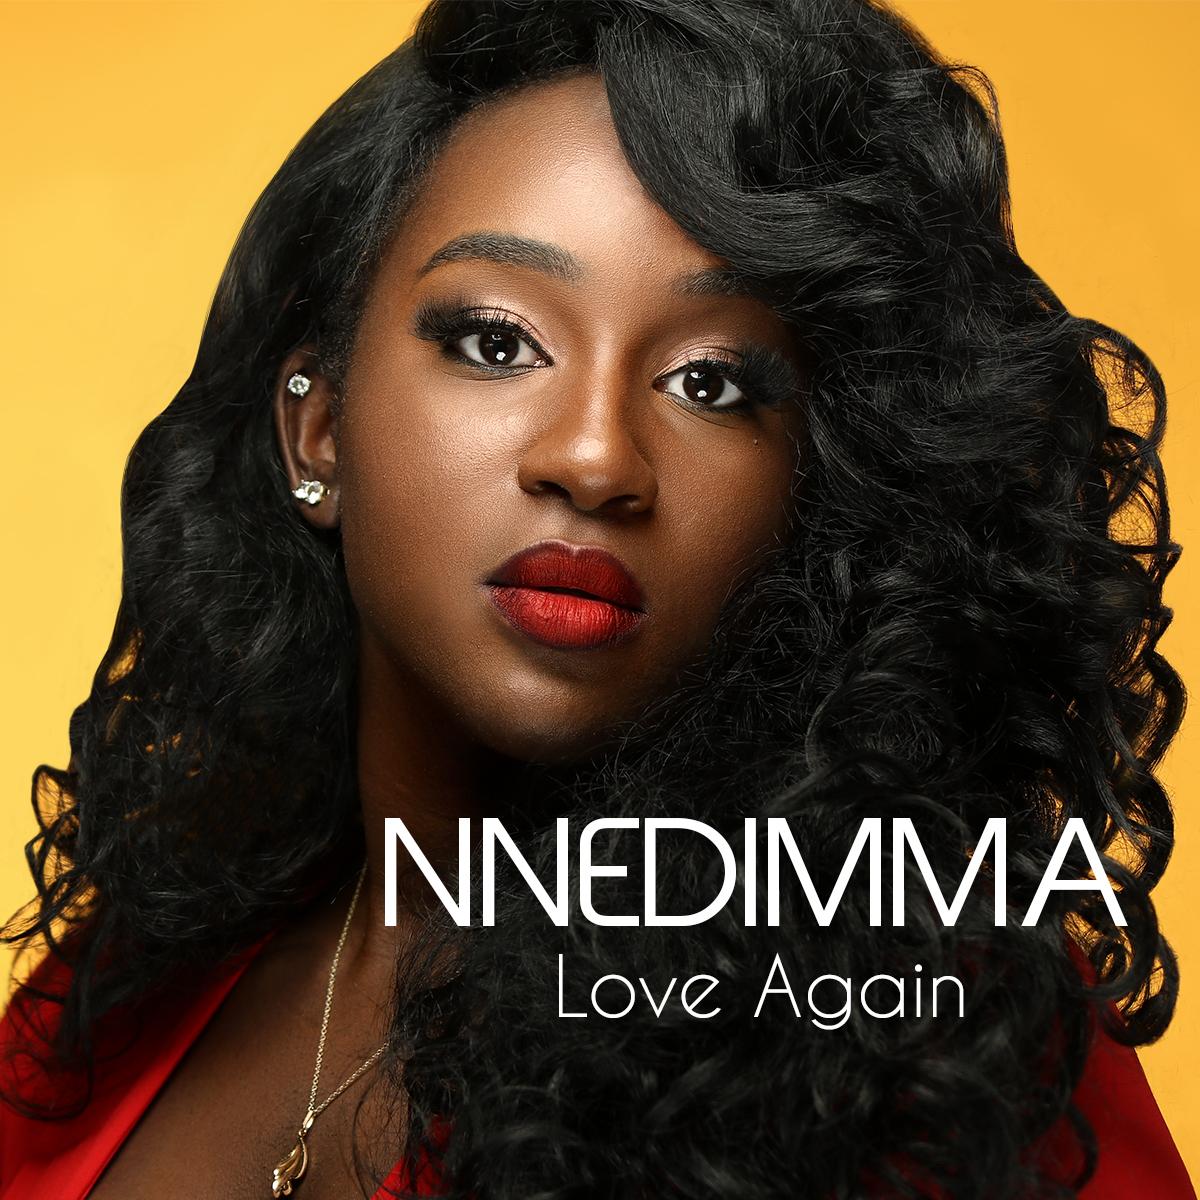 Nnedimma – Love Again